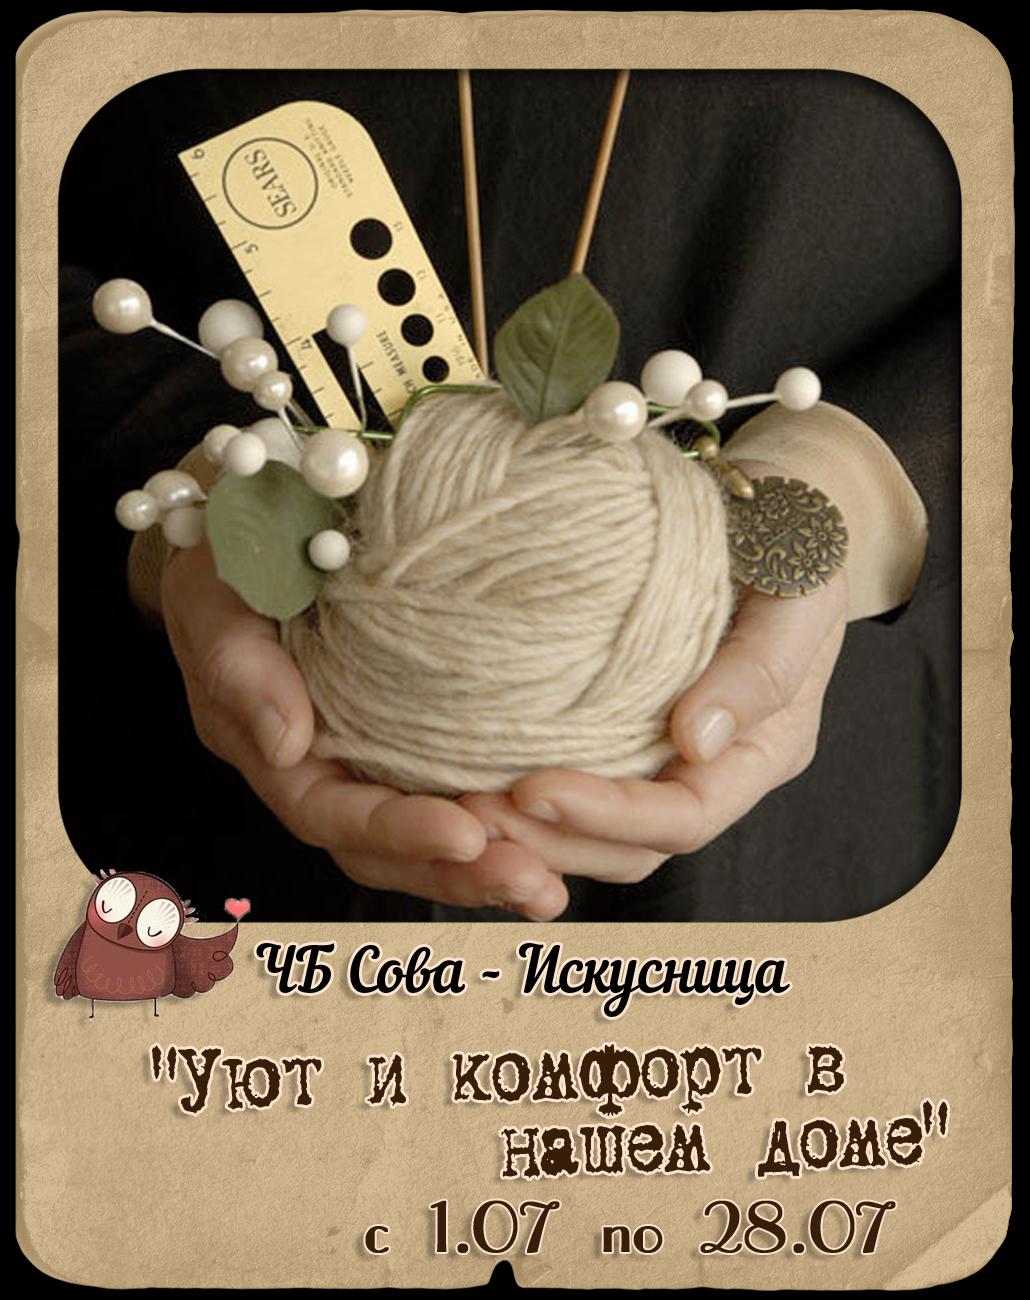 http://sovaiskusnica.blogspot.com/2014/07/blog-post.html